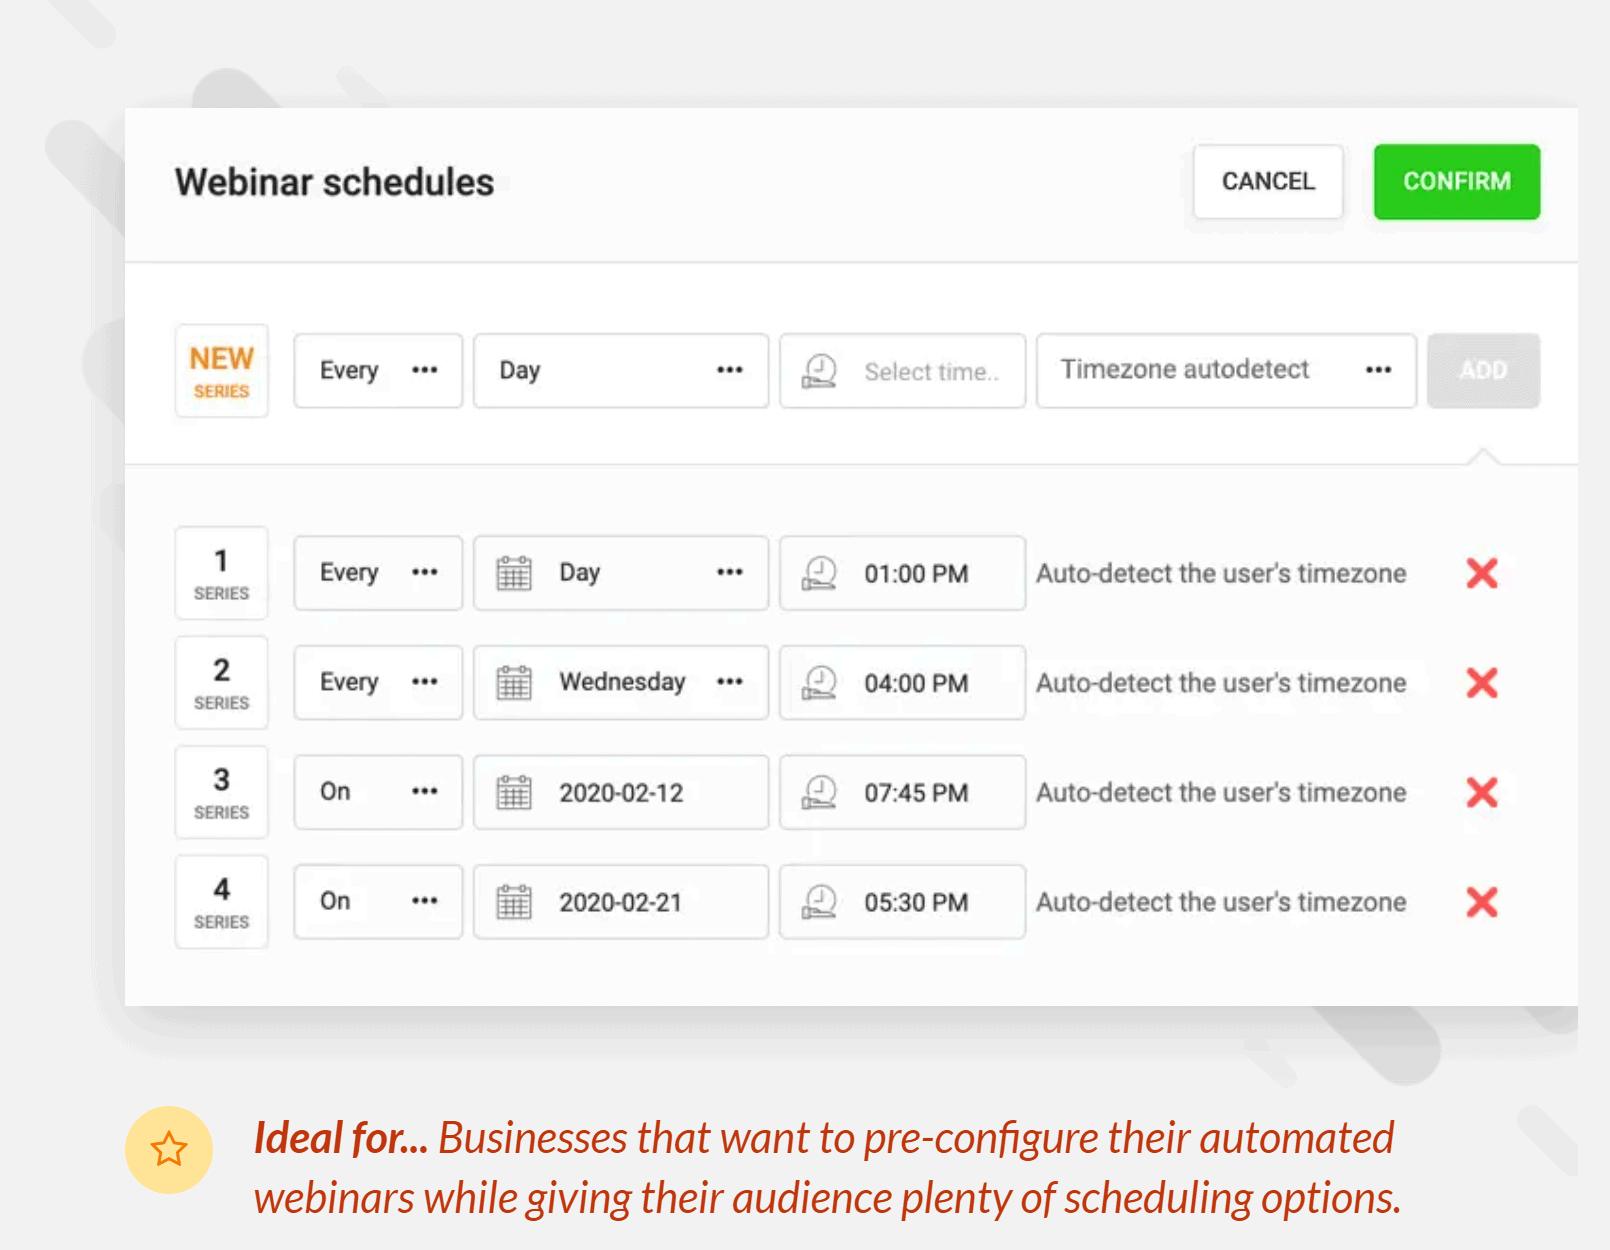 Webinar schedules